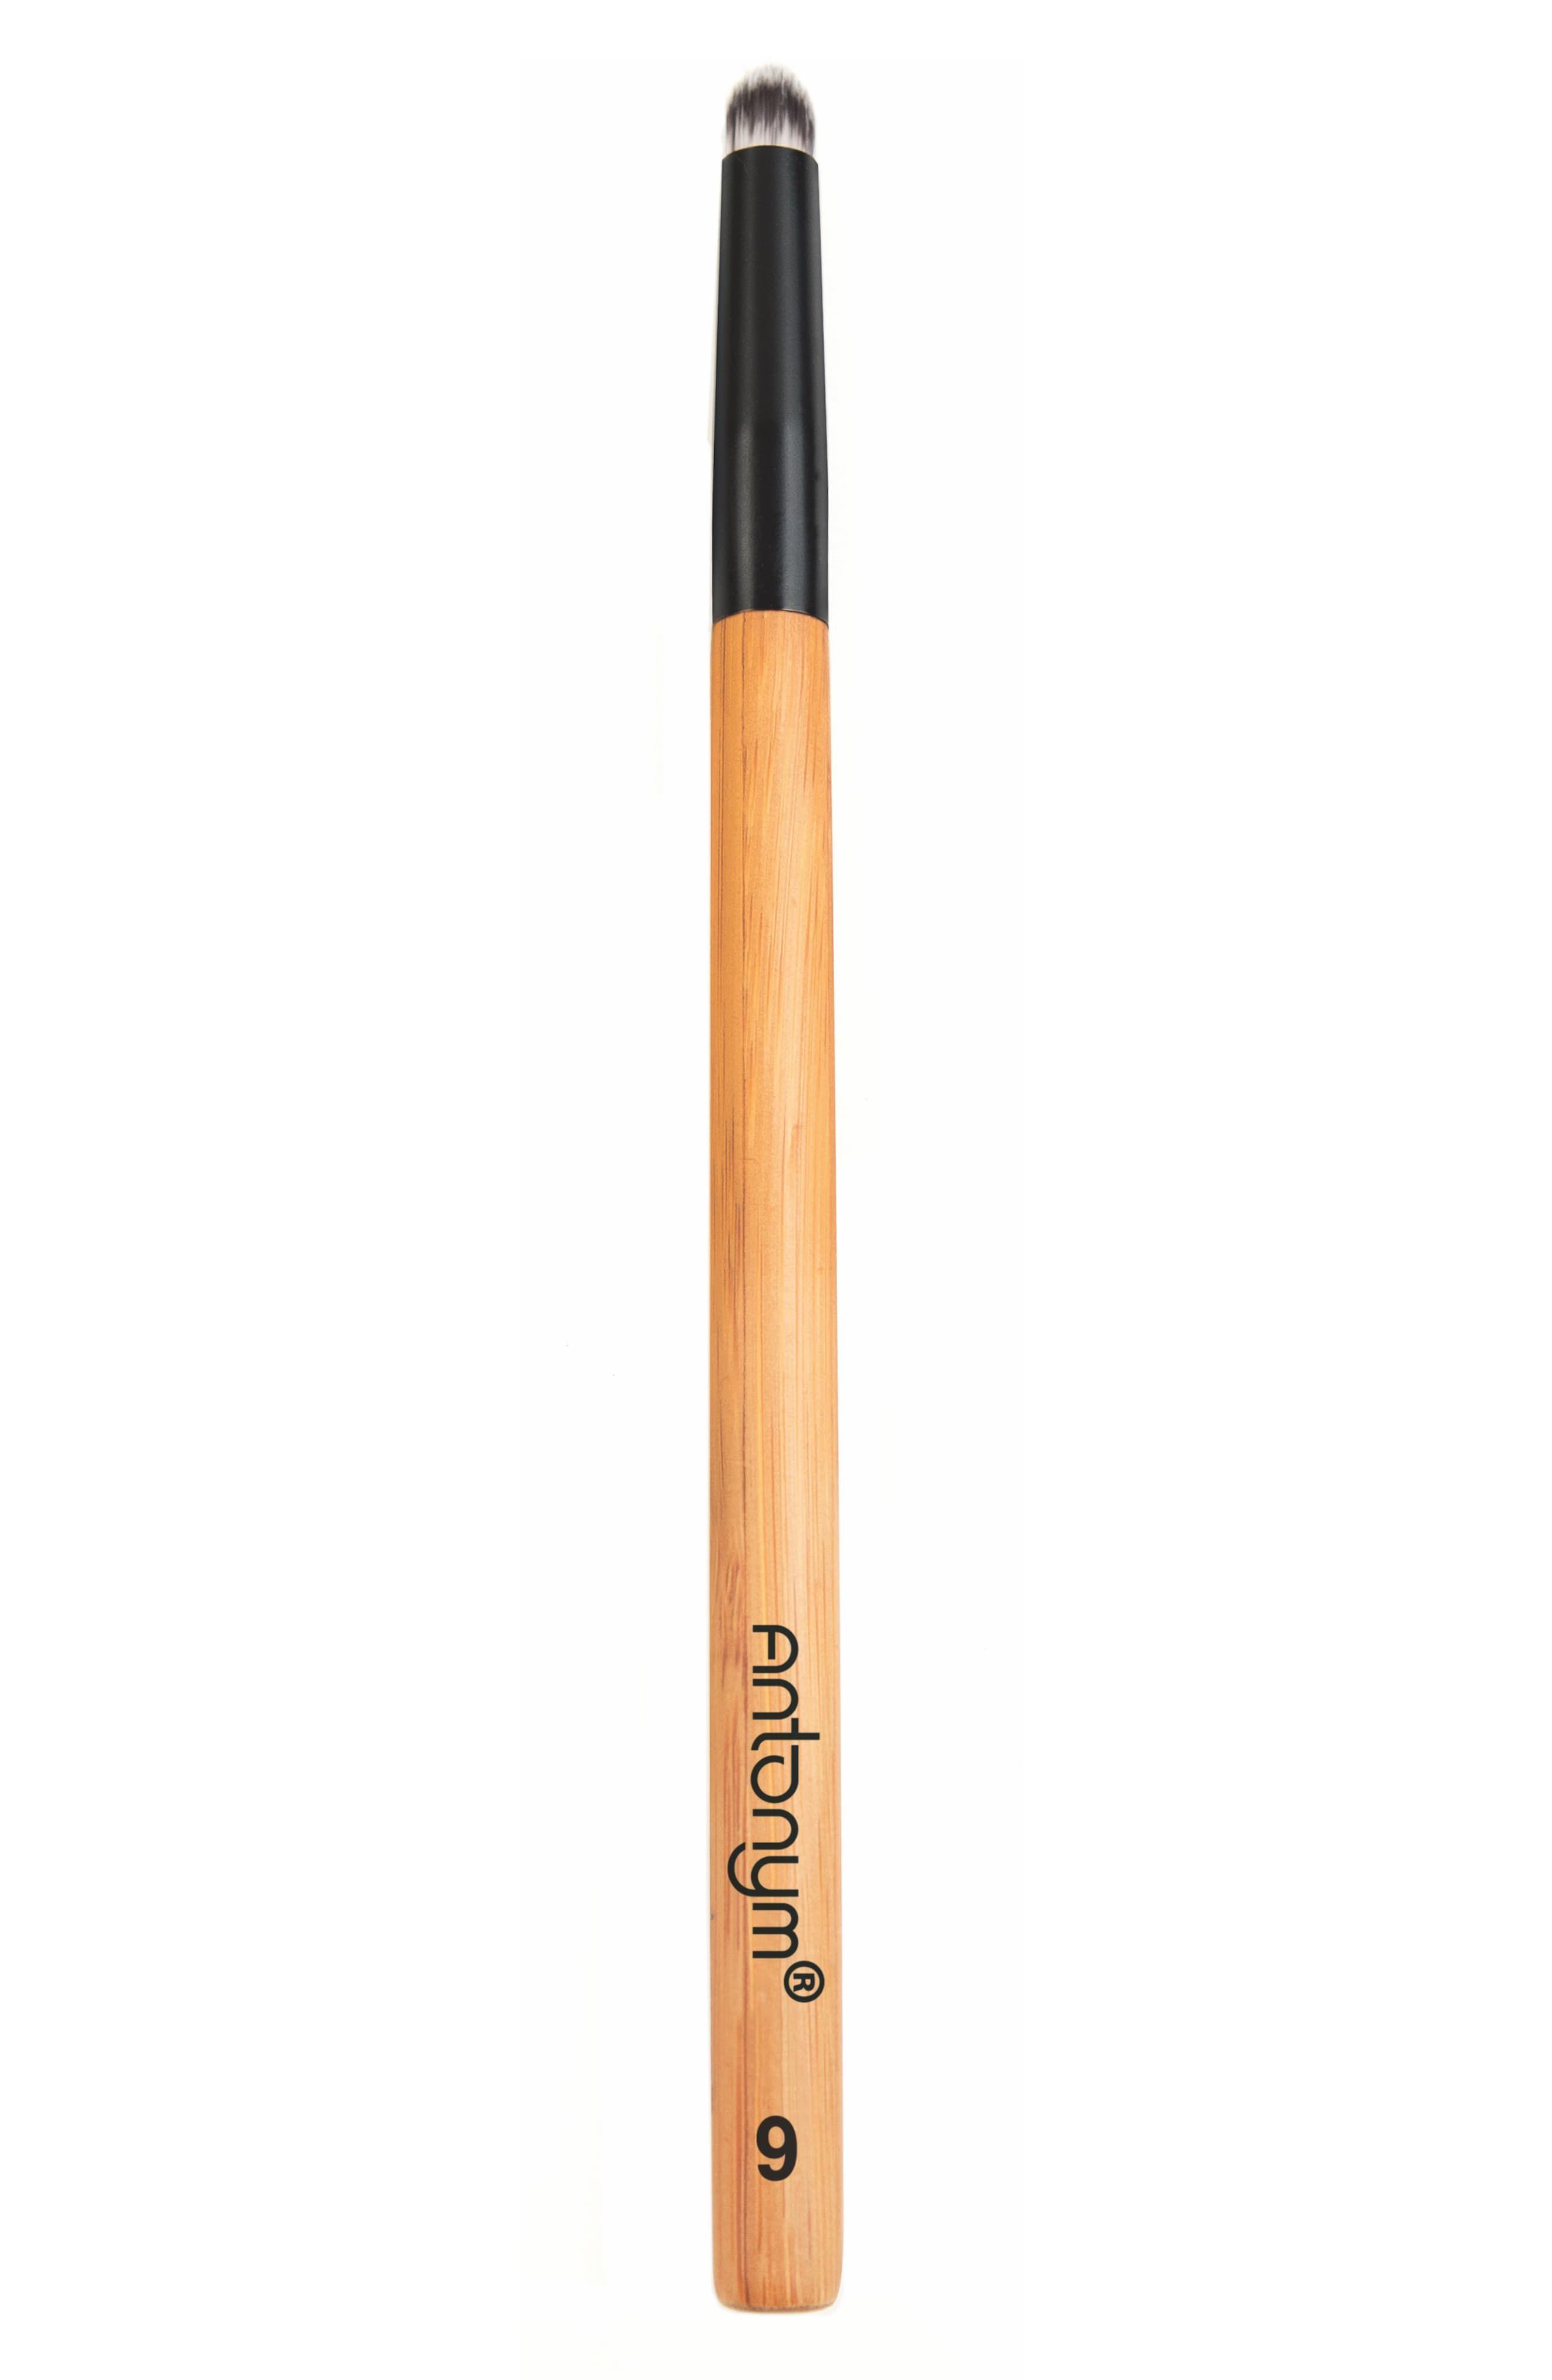 Antonym Large Pencil Brush Makeup, Makeup brushes